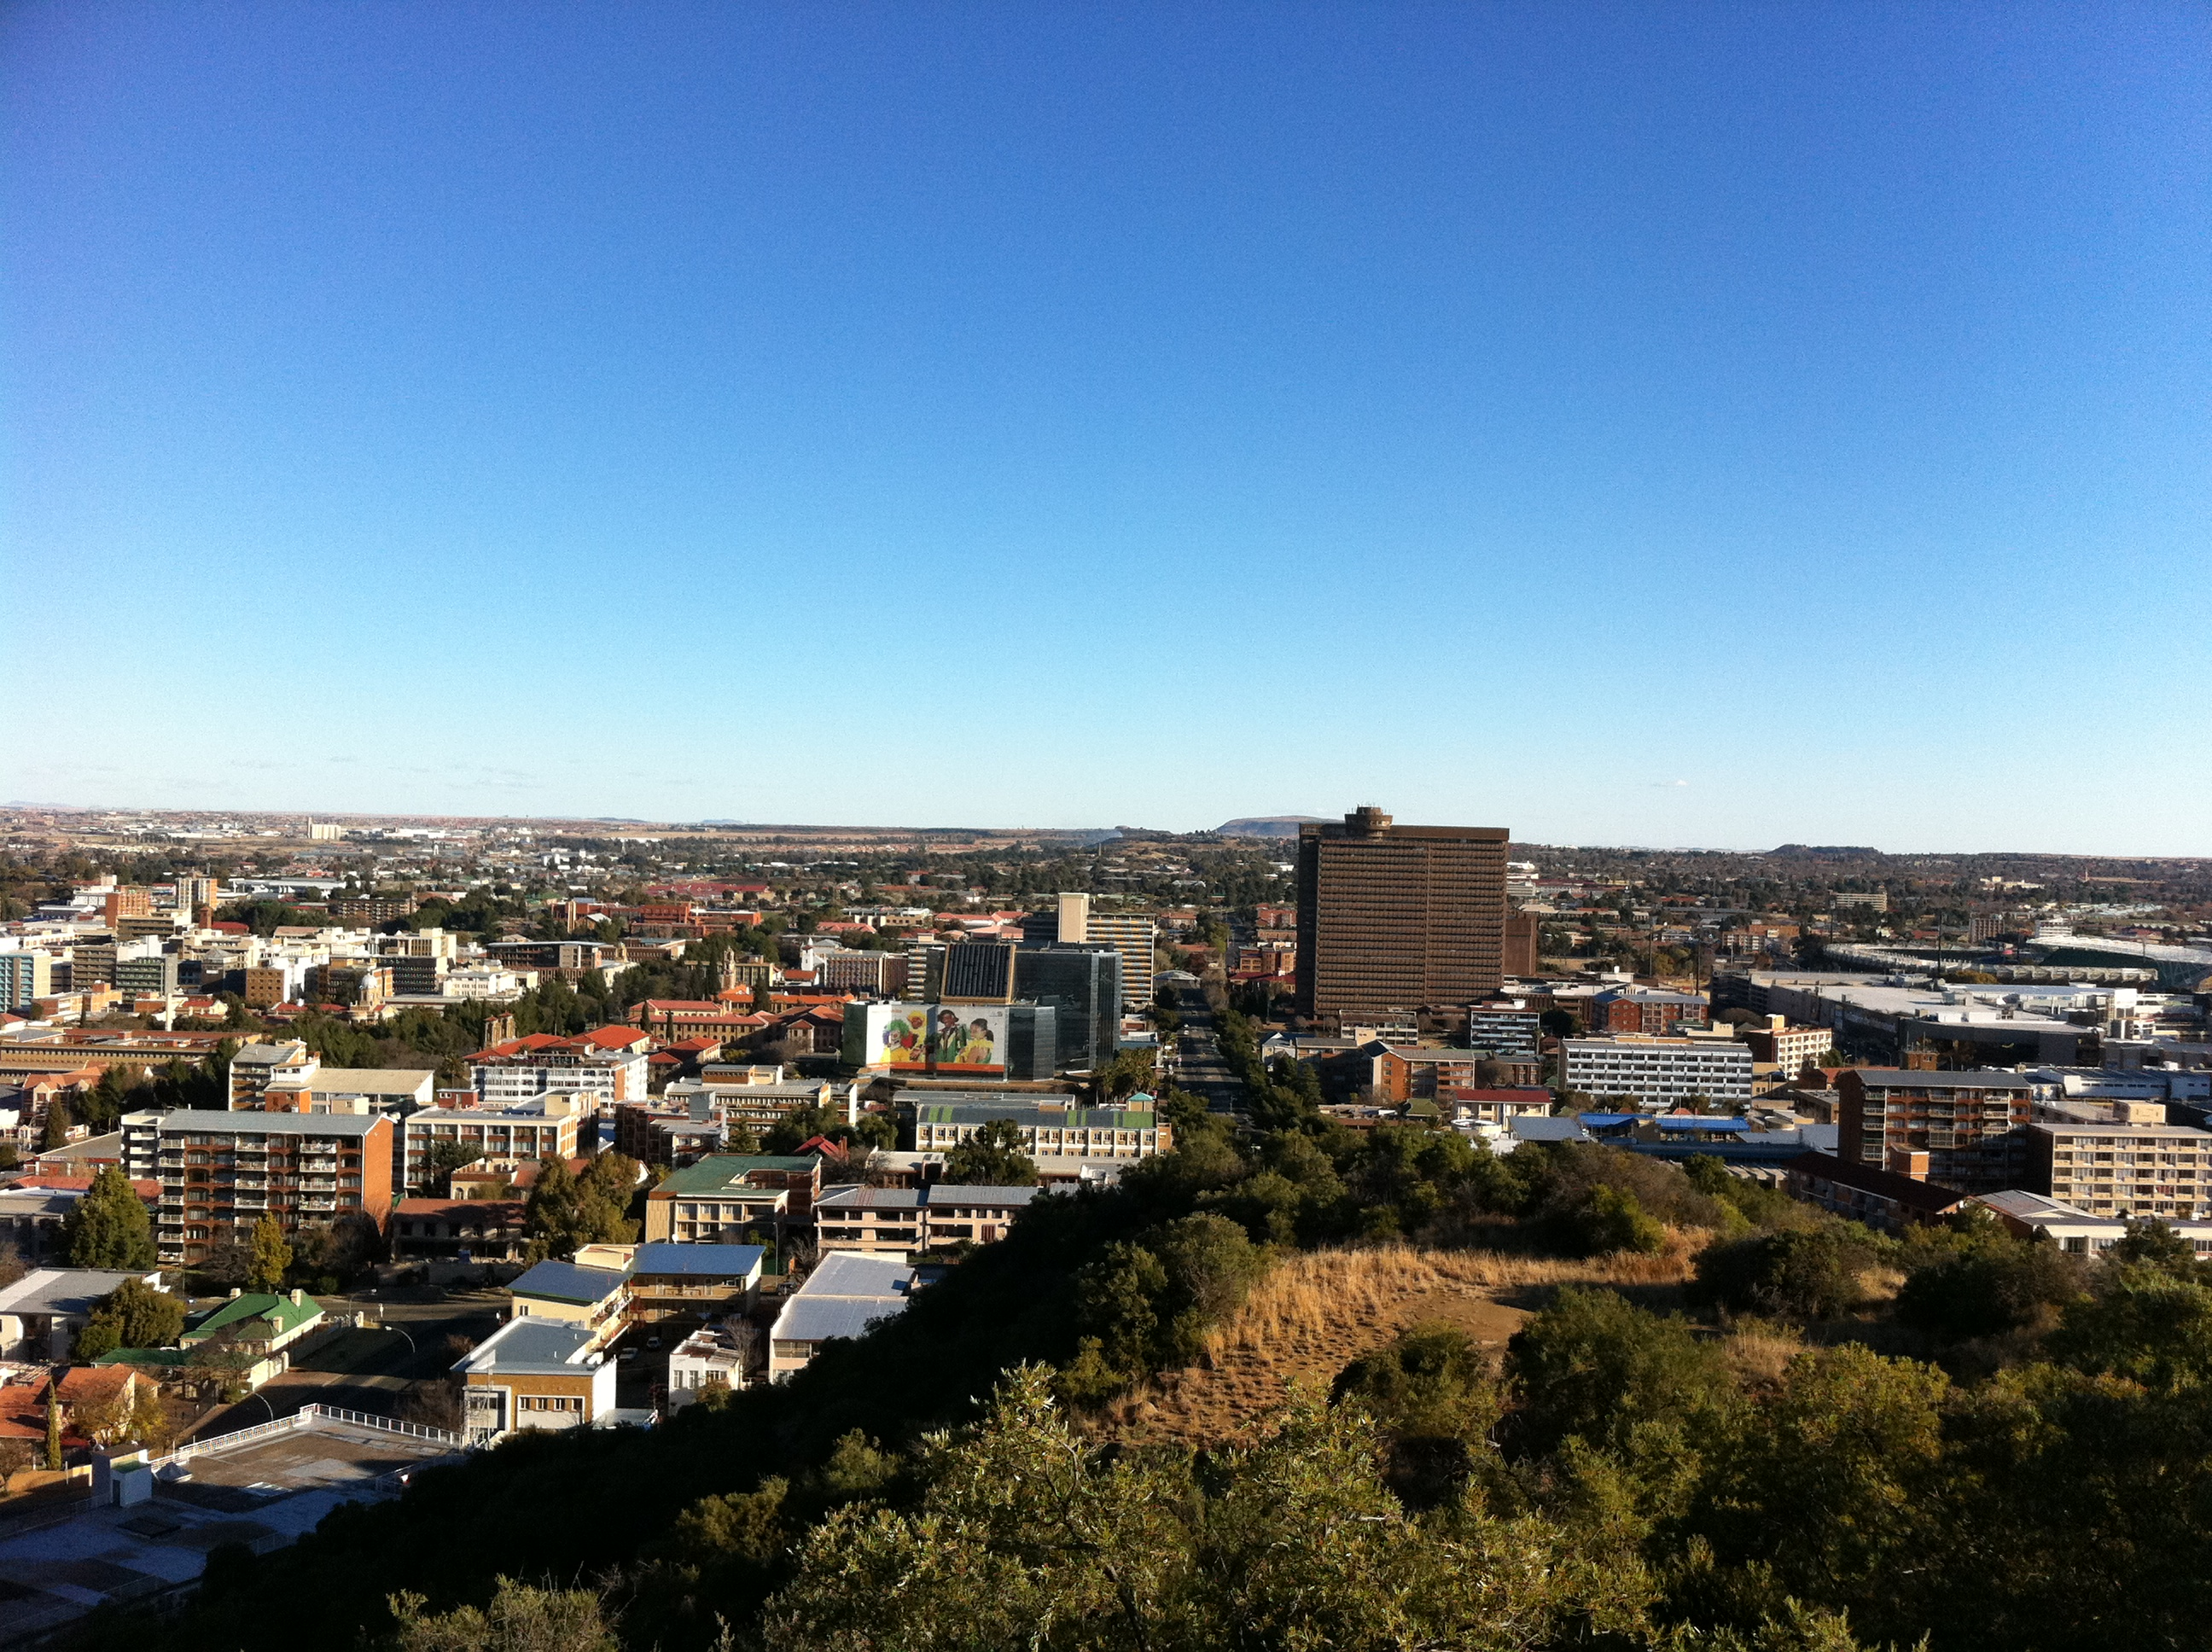 Bloemfontein Dating Bloemfontein Singles Bloemfontein Personals